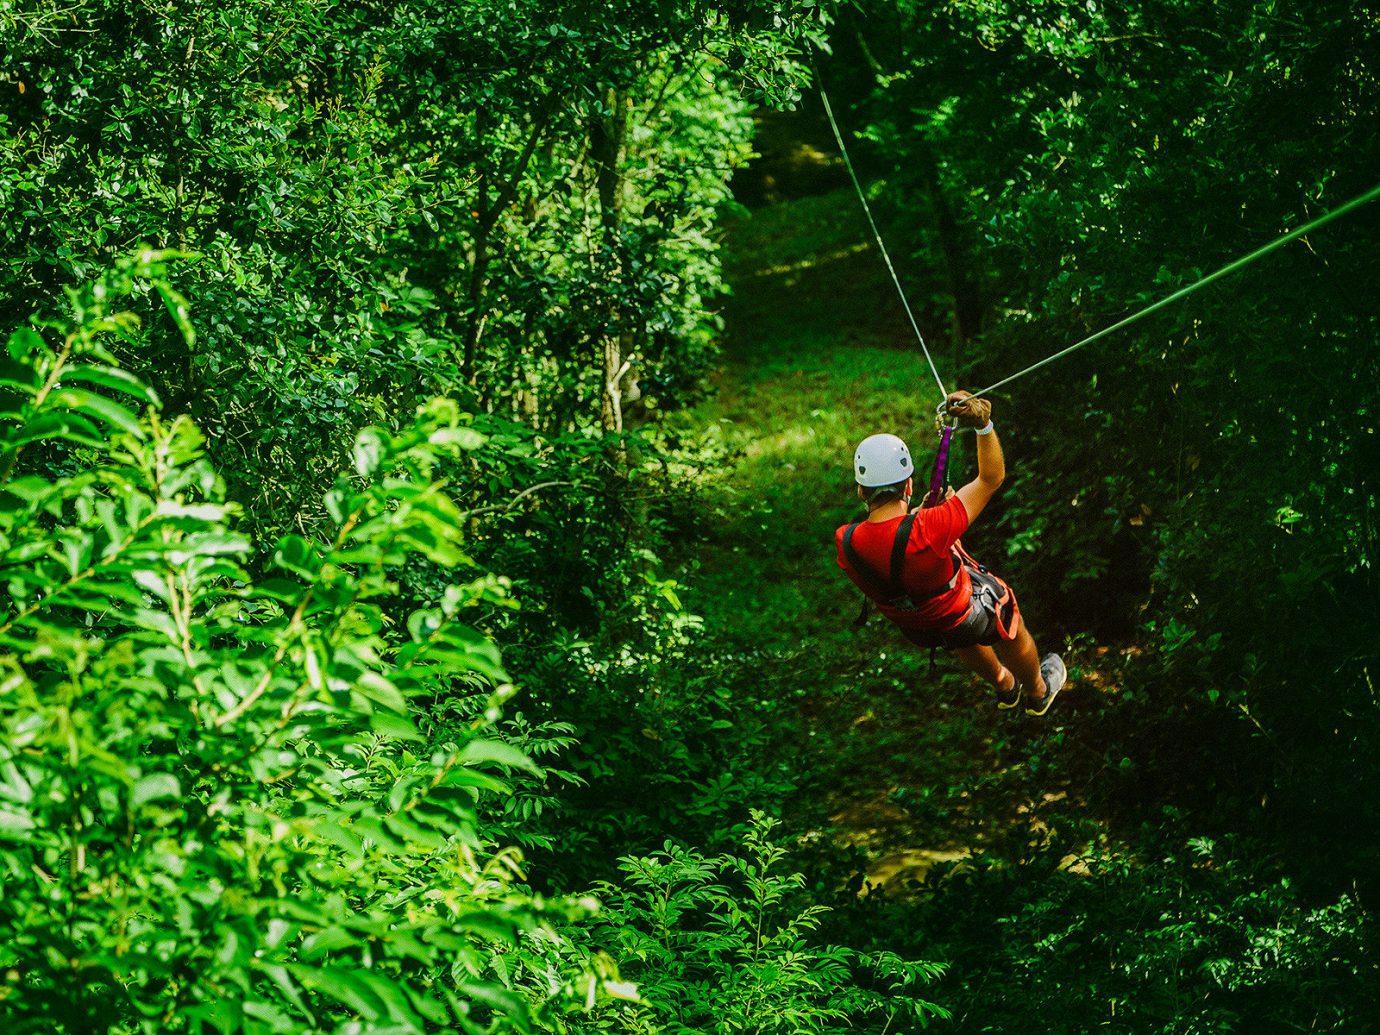 rain forest Trip Ideas zipline tree outdoor habitat green natural environment Forest rainforest Jungle Sport Adventure extreme sport screenshot woodland abseiling wooded